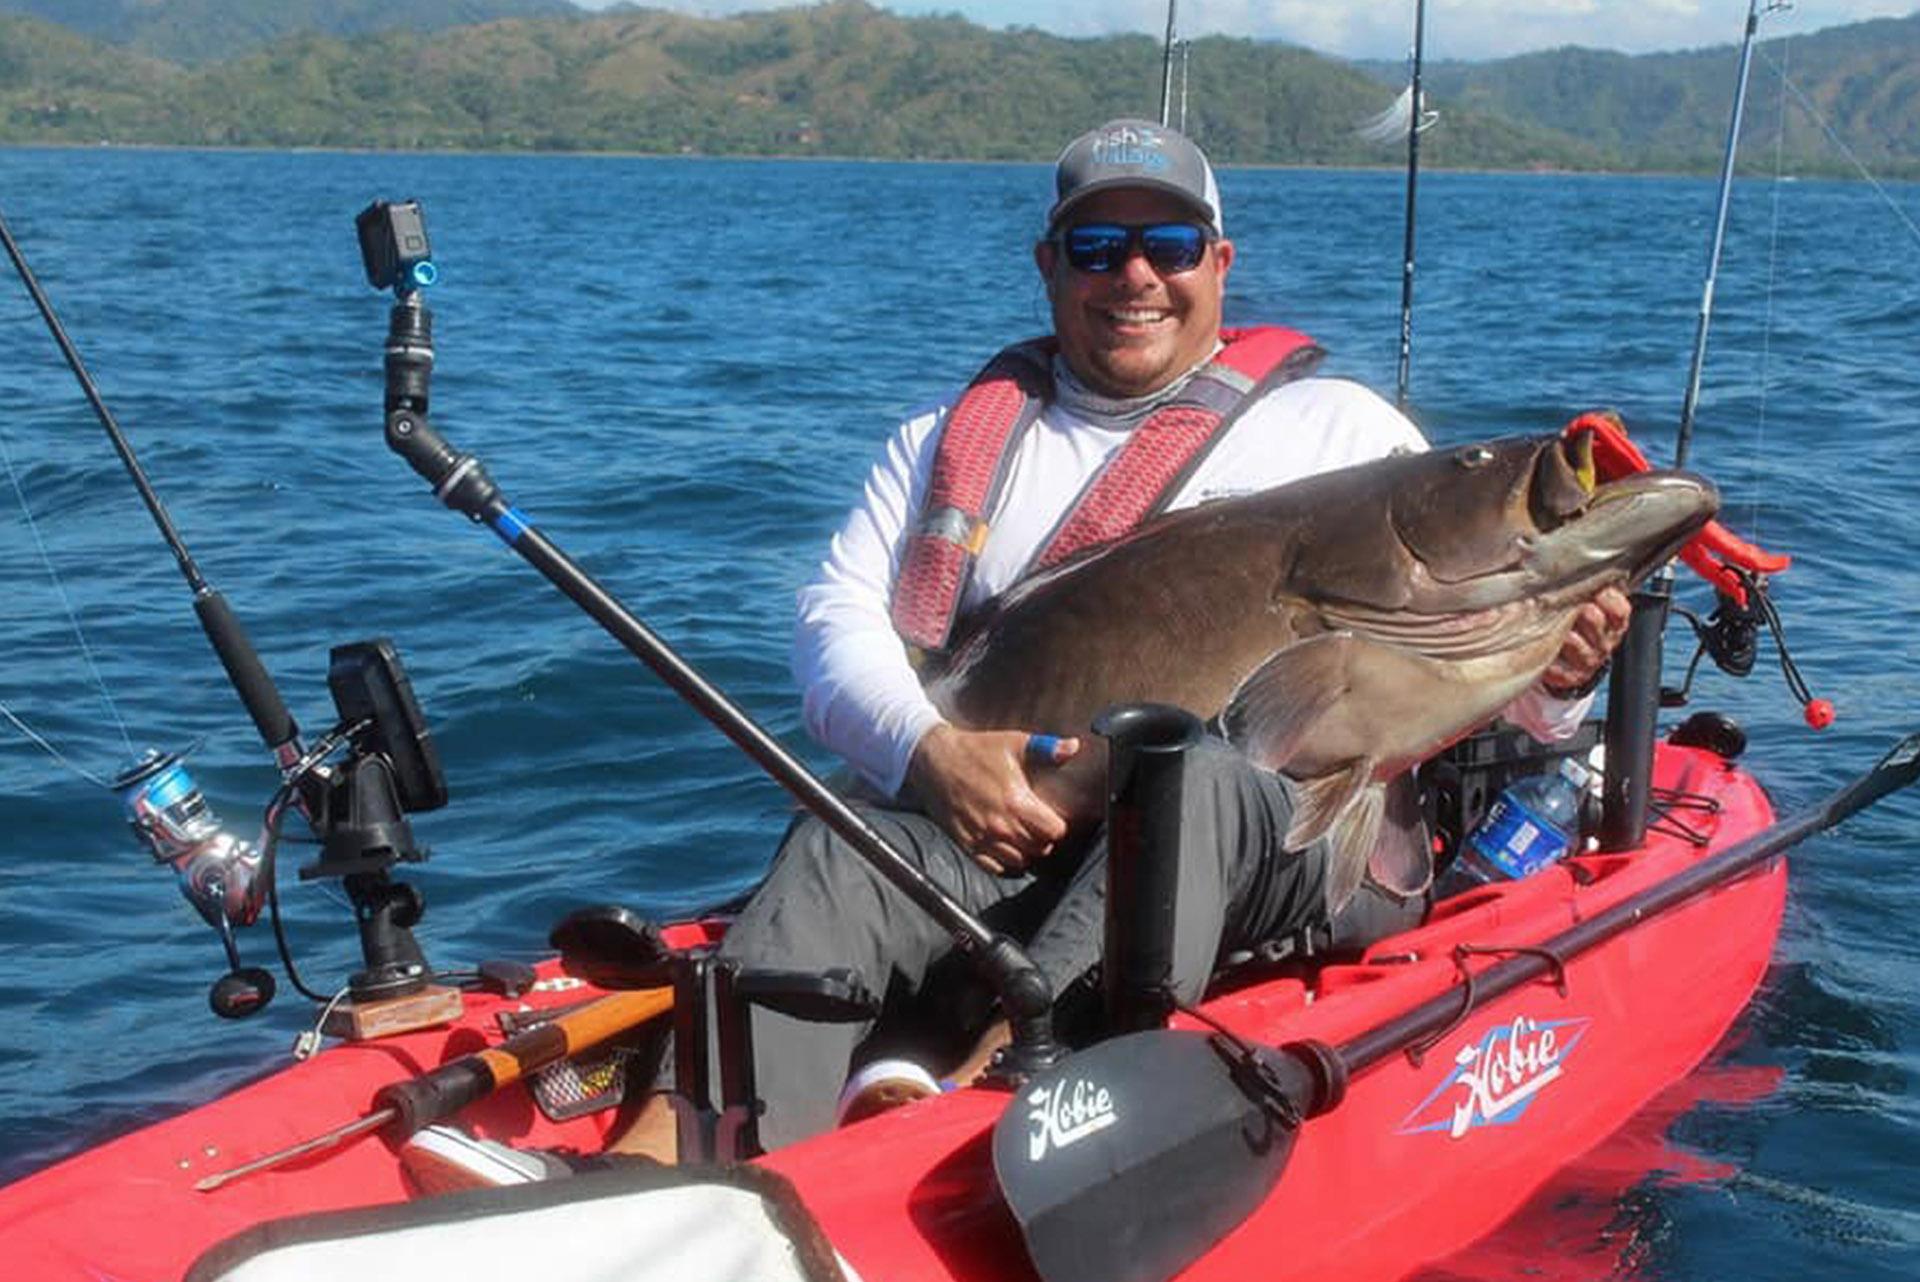 10 Flutter Jig Tips For Tuna, Wahoo And Grouper | Kayak Angler